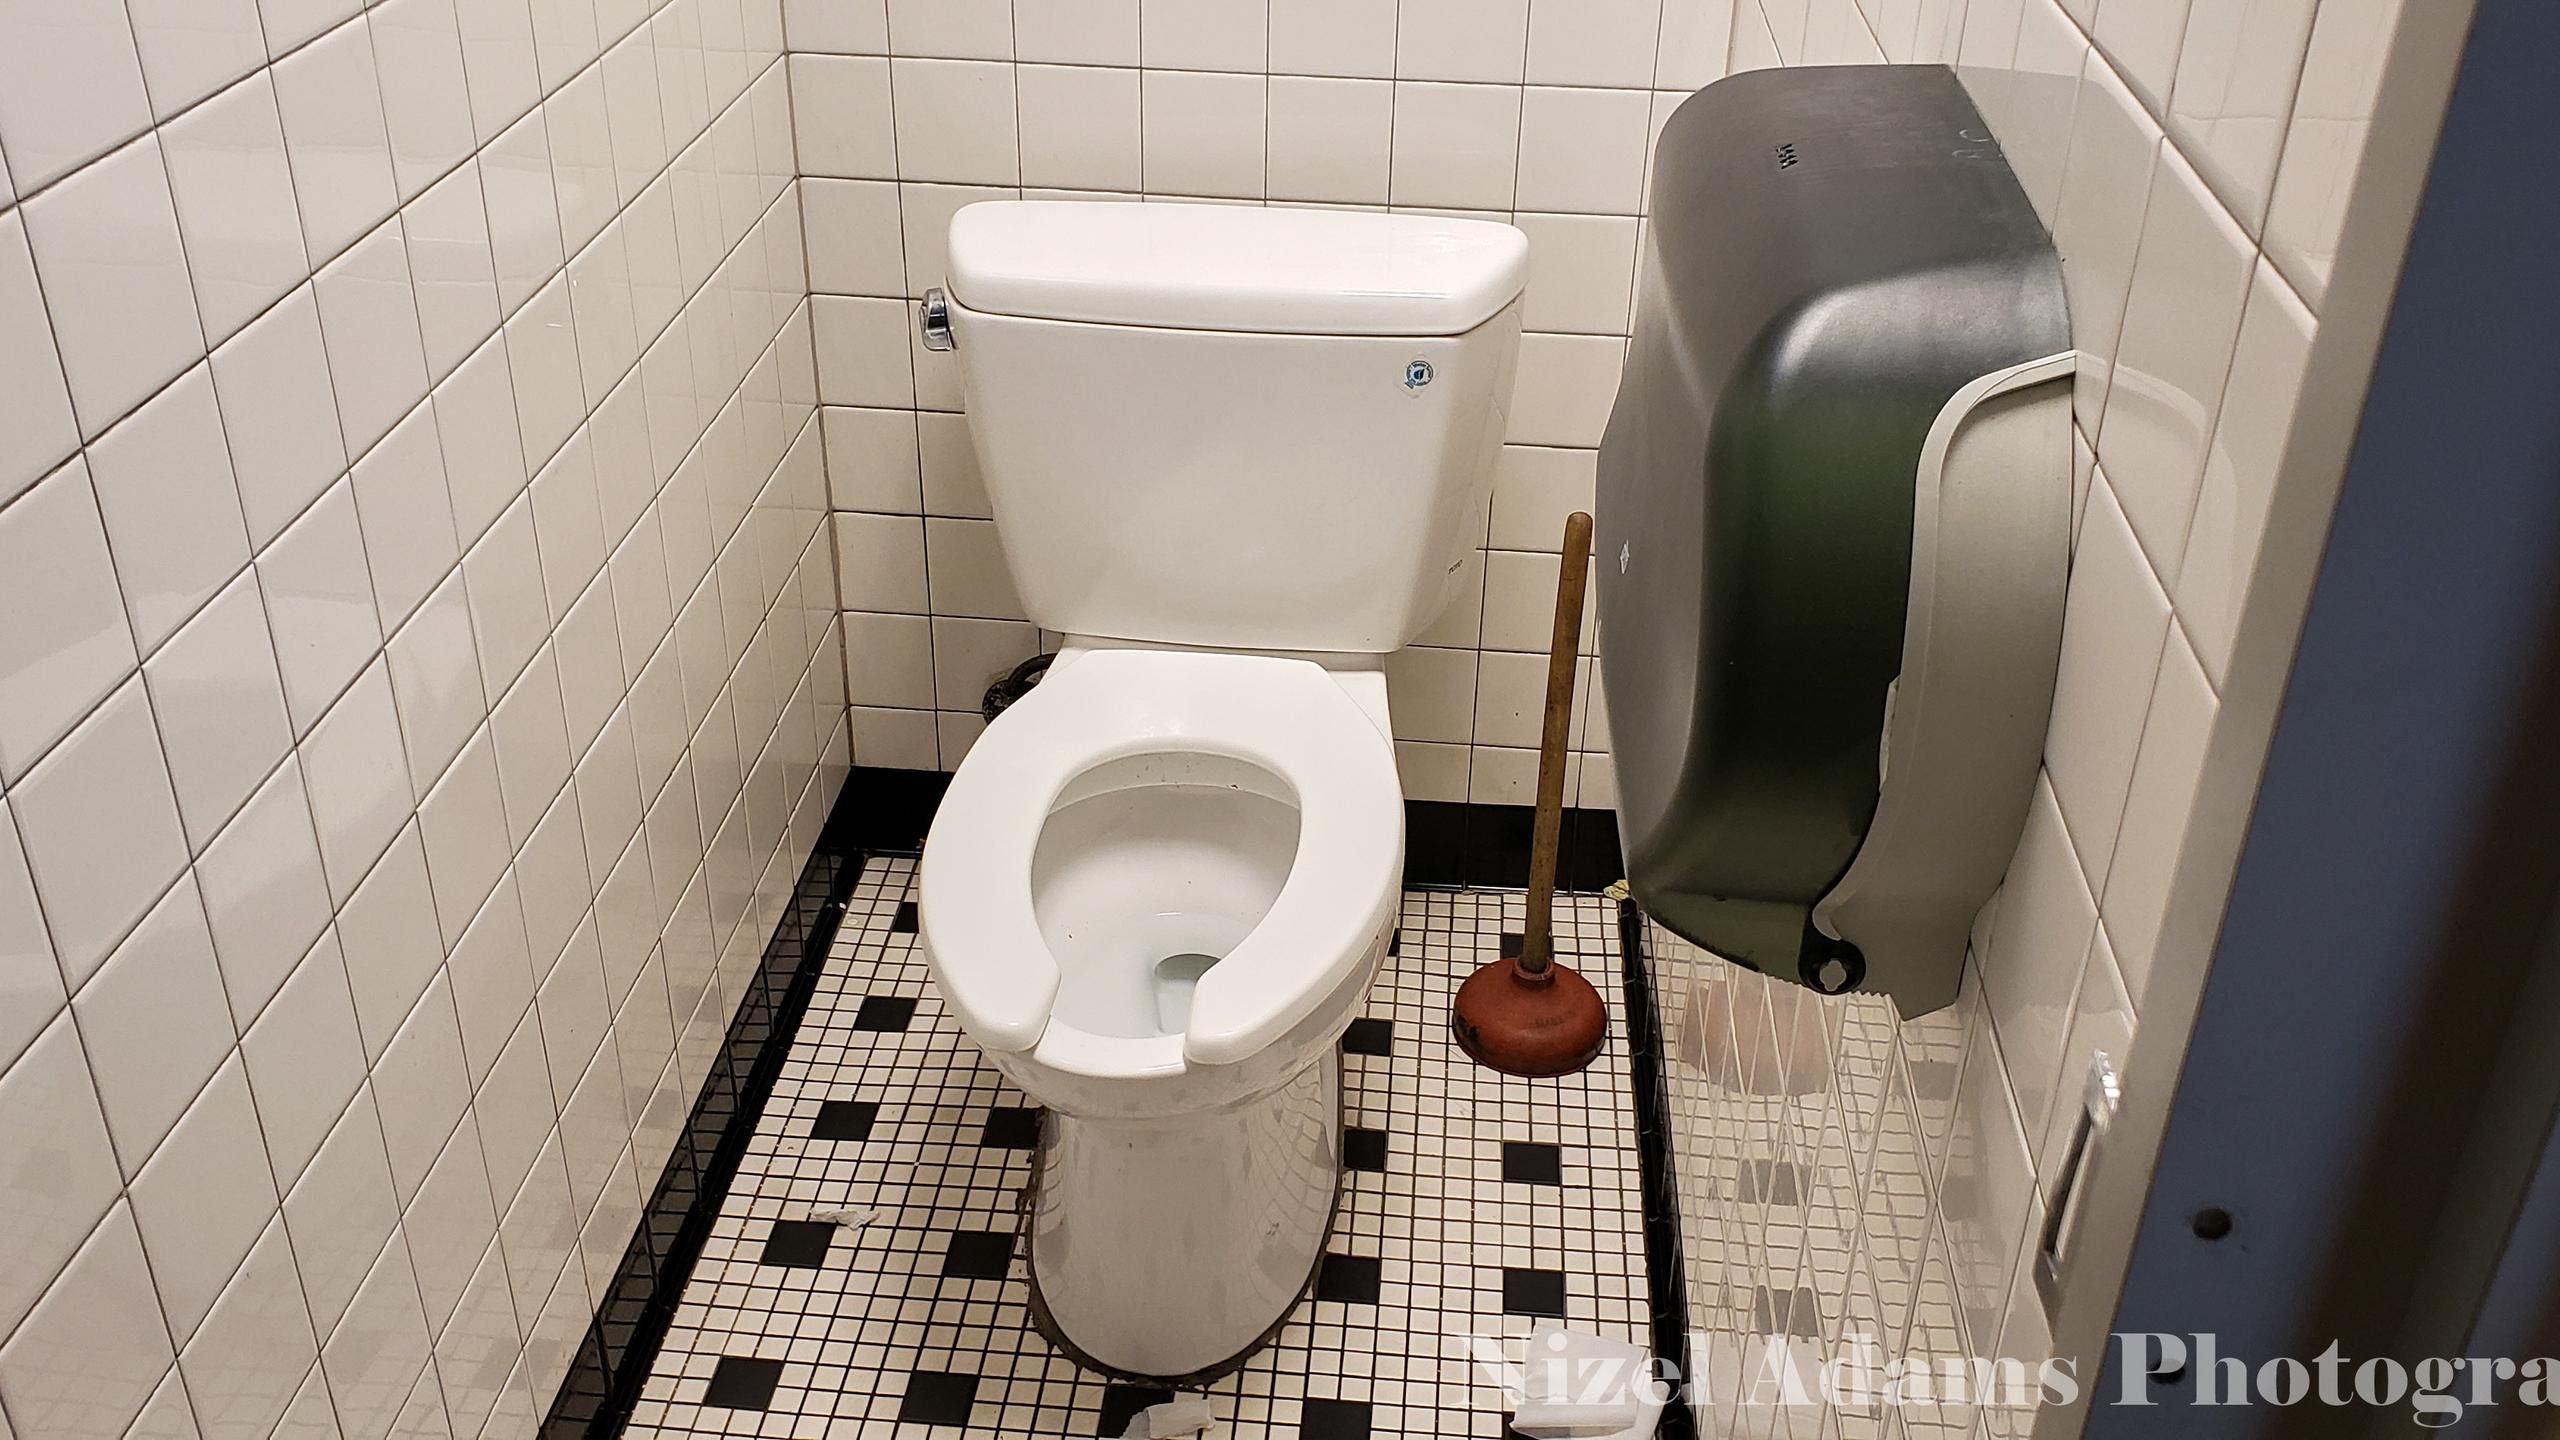 Men's Bathroom Stall at Steak n' Shake Aurora, Illinois